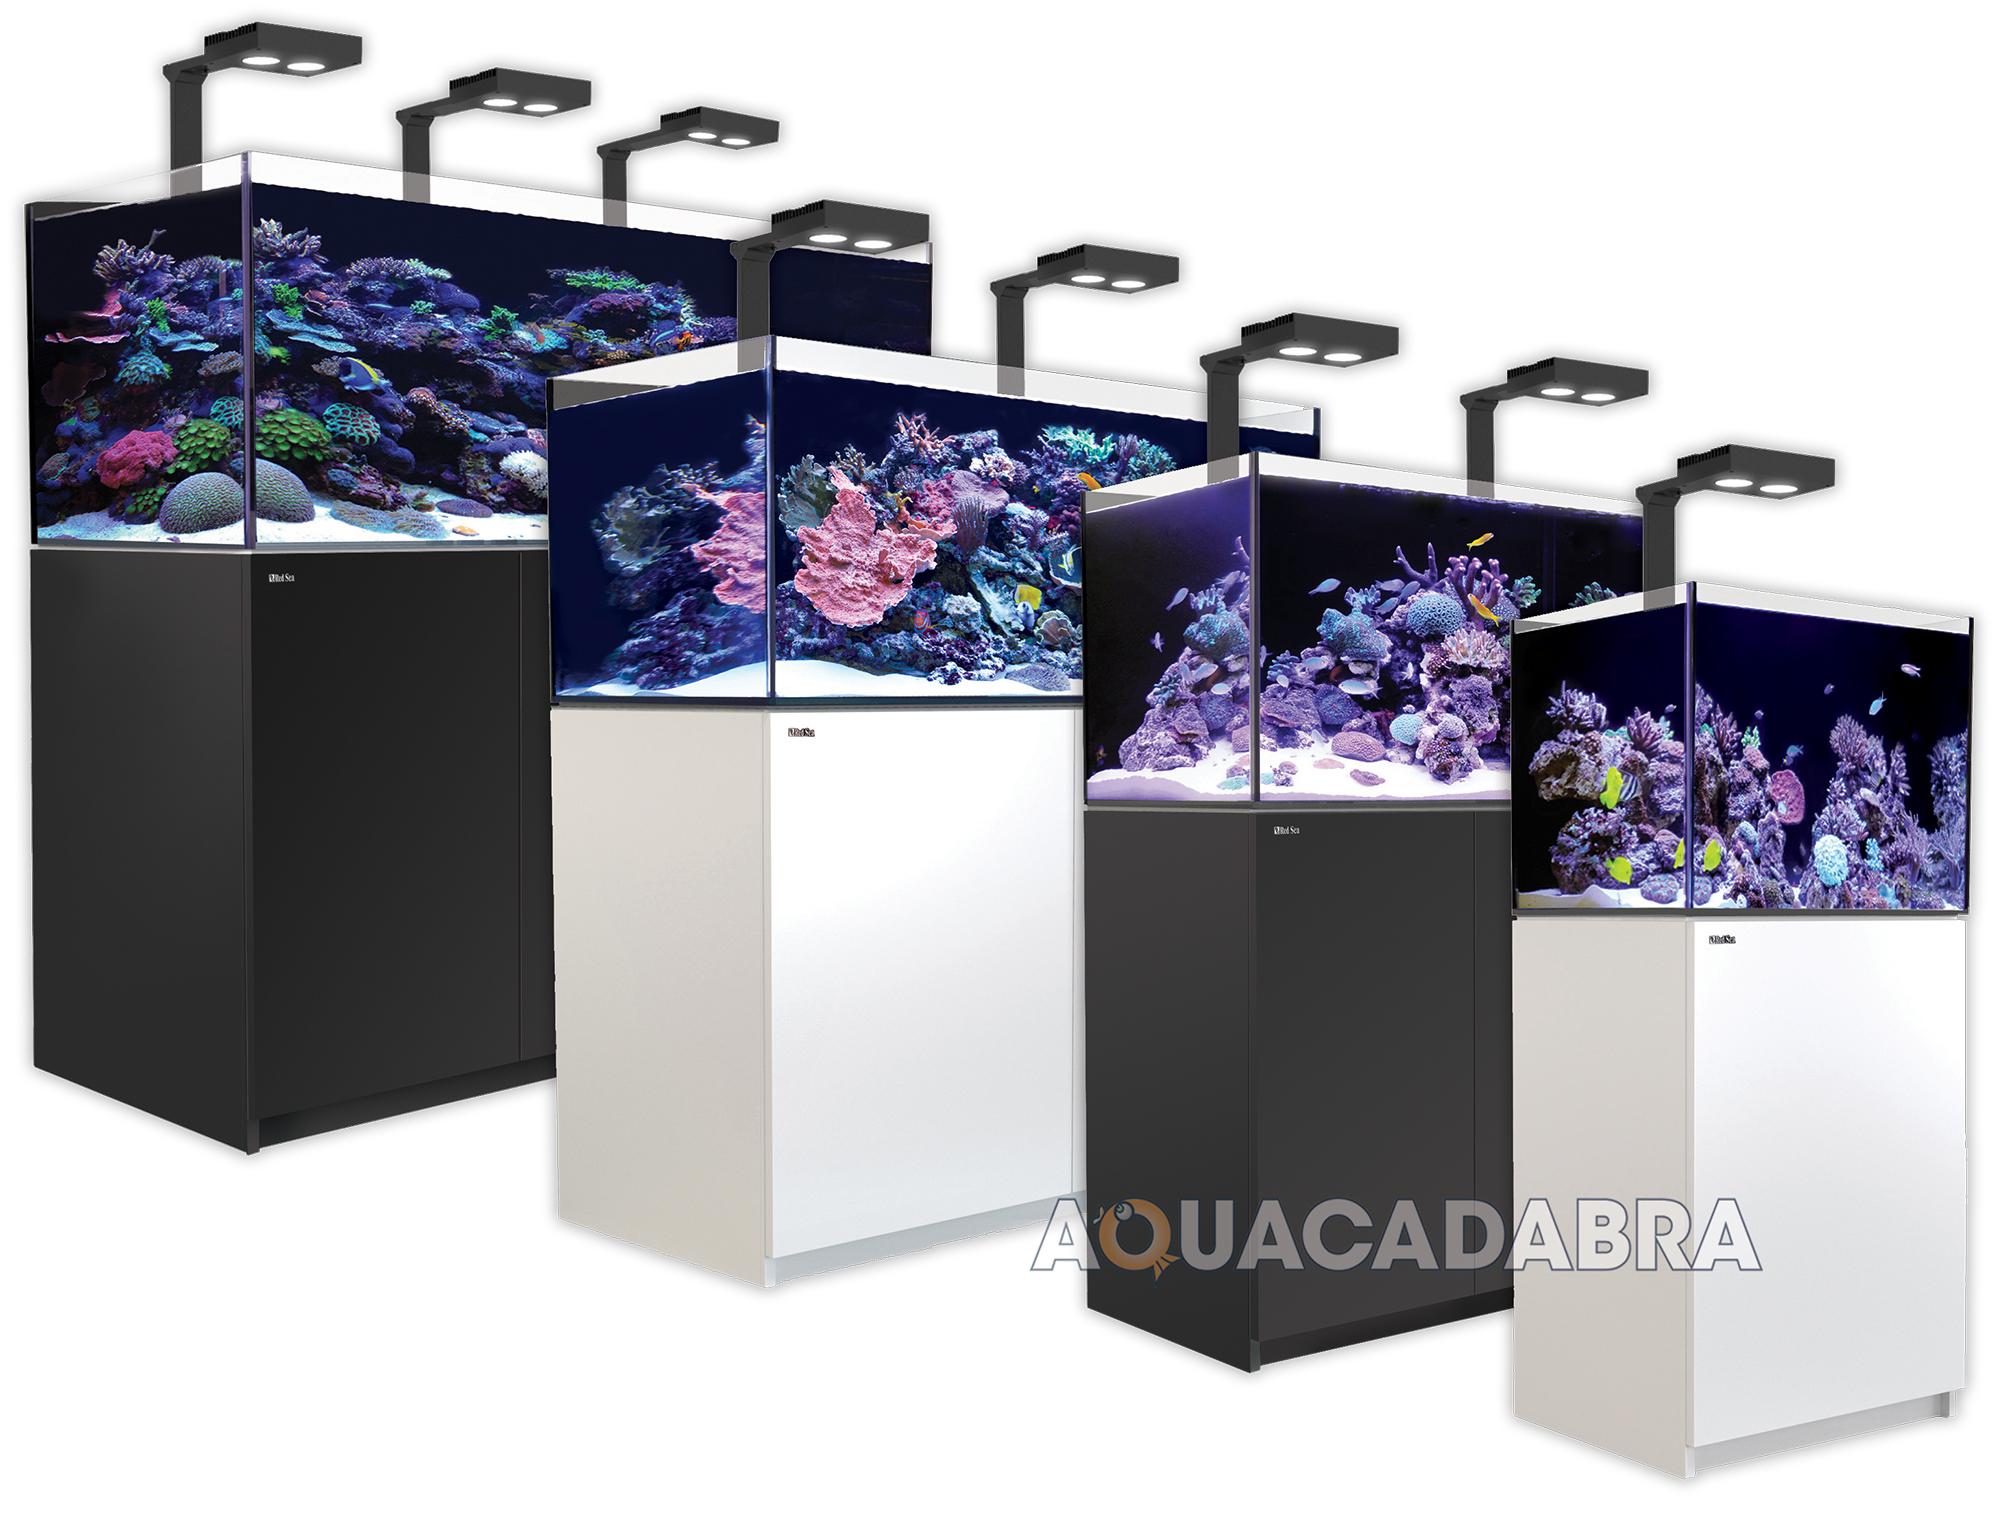 Image Result For Complete Marine Aquarium Package Uk